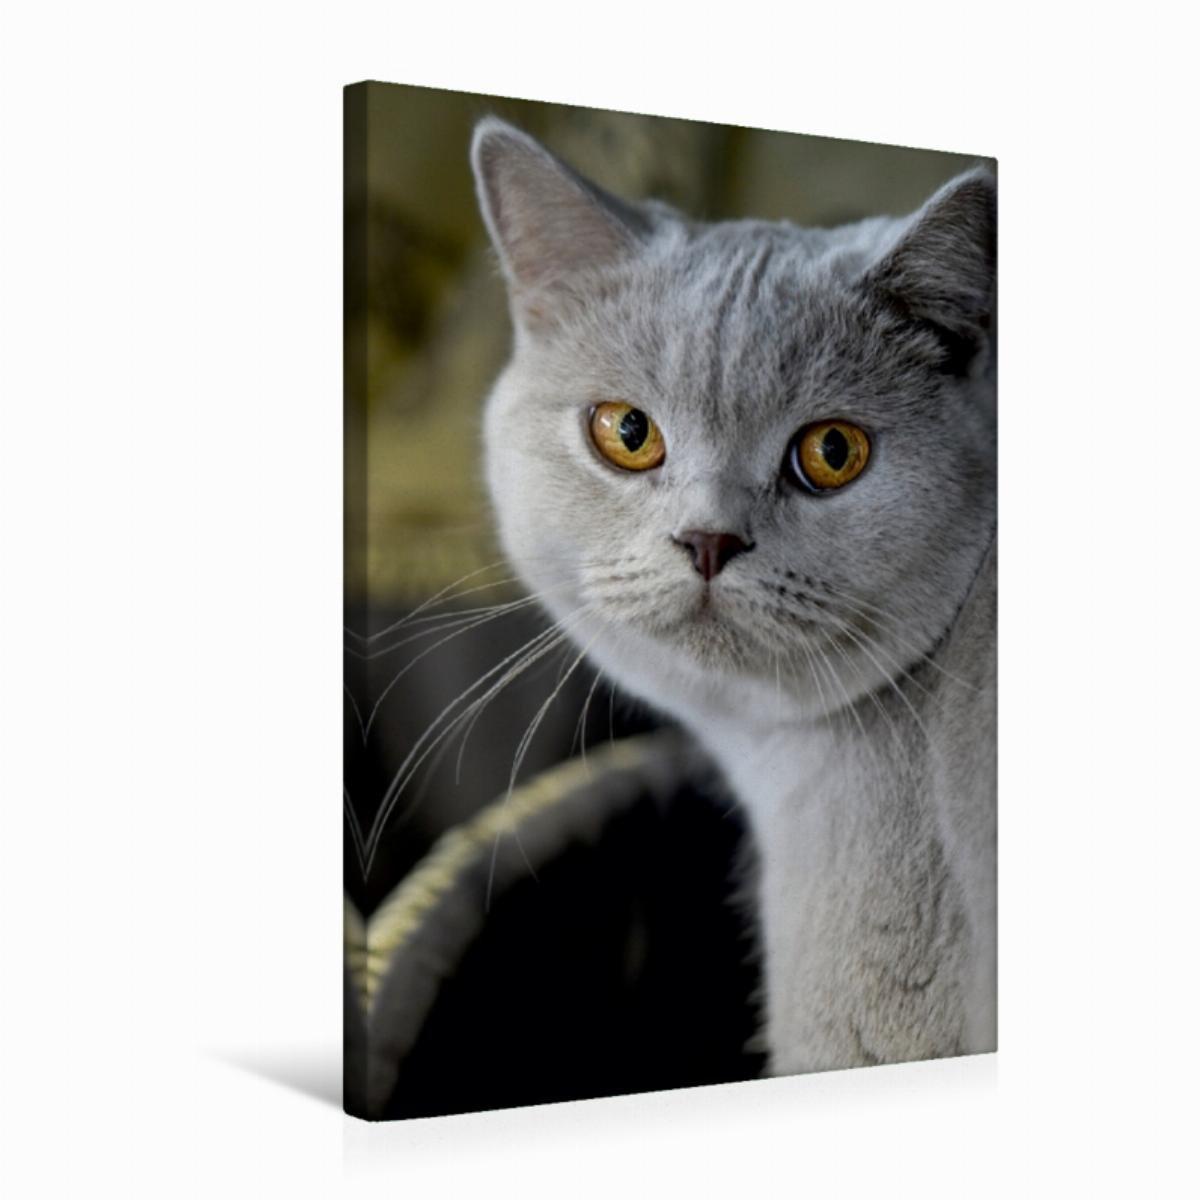 Calvendo Leinwand Britisch Kurzhaar Katze 50x75cm, Special-Edition Wandbild, Bild auf Keilrahmen, Fertigbild auf hochwertigem Textil, Leinwanddruck, kein Poster